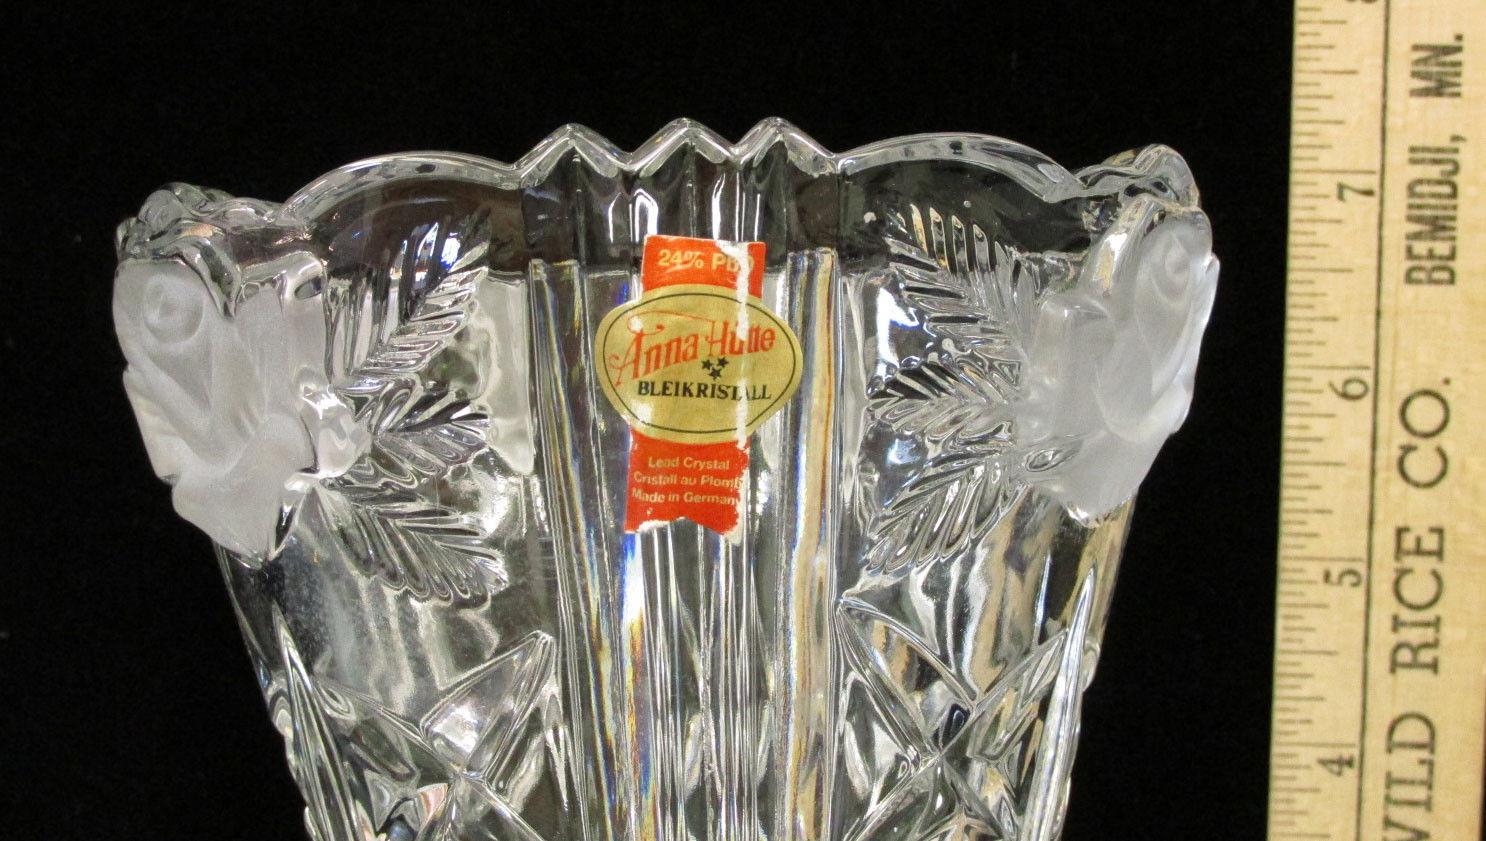 anna hutte bleikristall lead crystal vase of glass crystal vase frosted rose anna hutte bleikristall 7 3 4 tall regarding crystal vase frosted rose anna hutte bleikristall 7 3 4 tall diamond 2 of 4